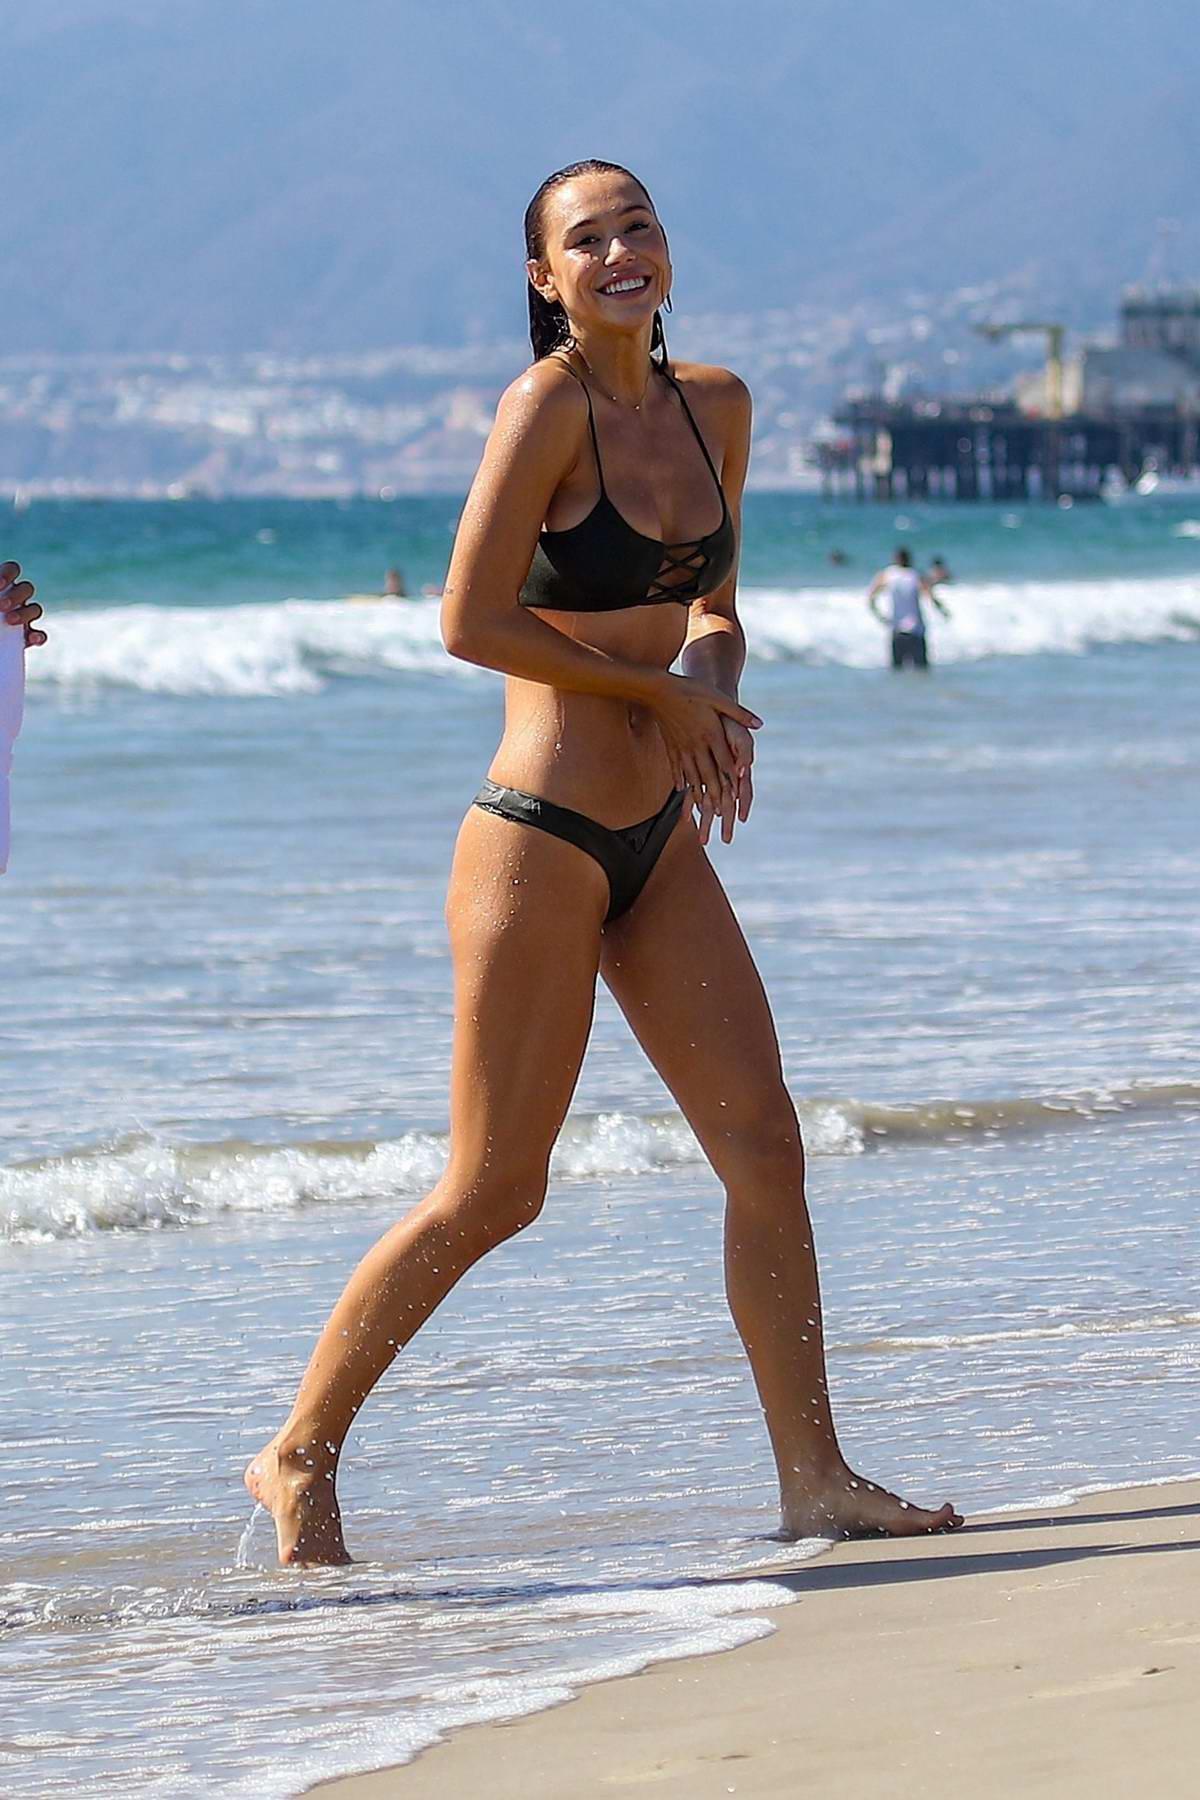 Alexis Ren wears a green bikini while enjoying a beach day in Santa Monica, California